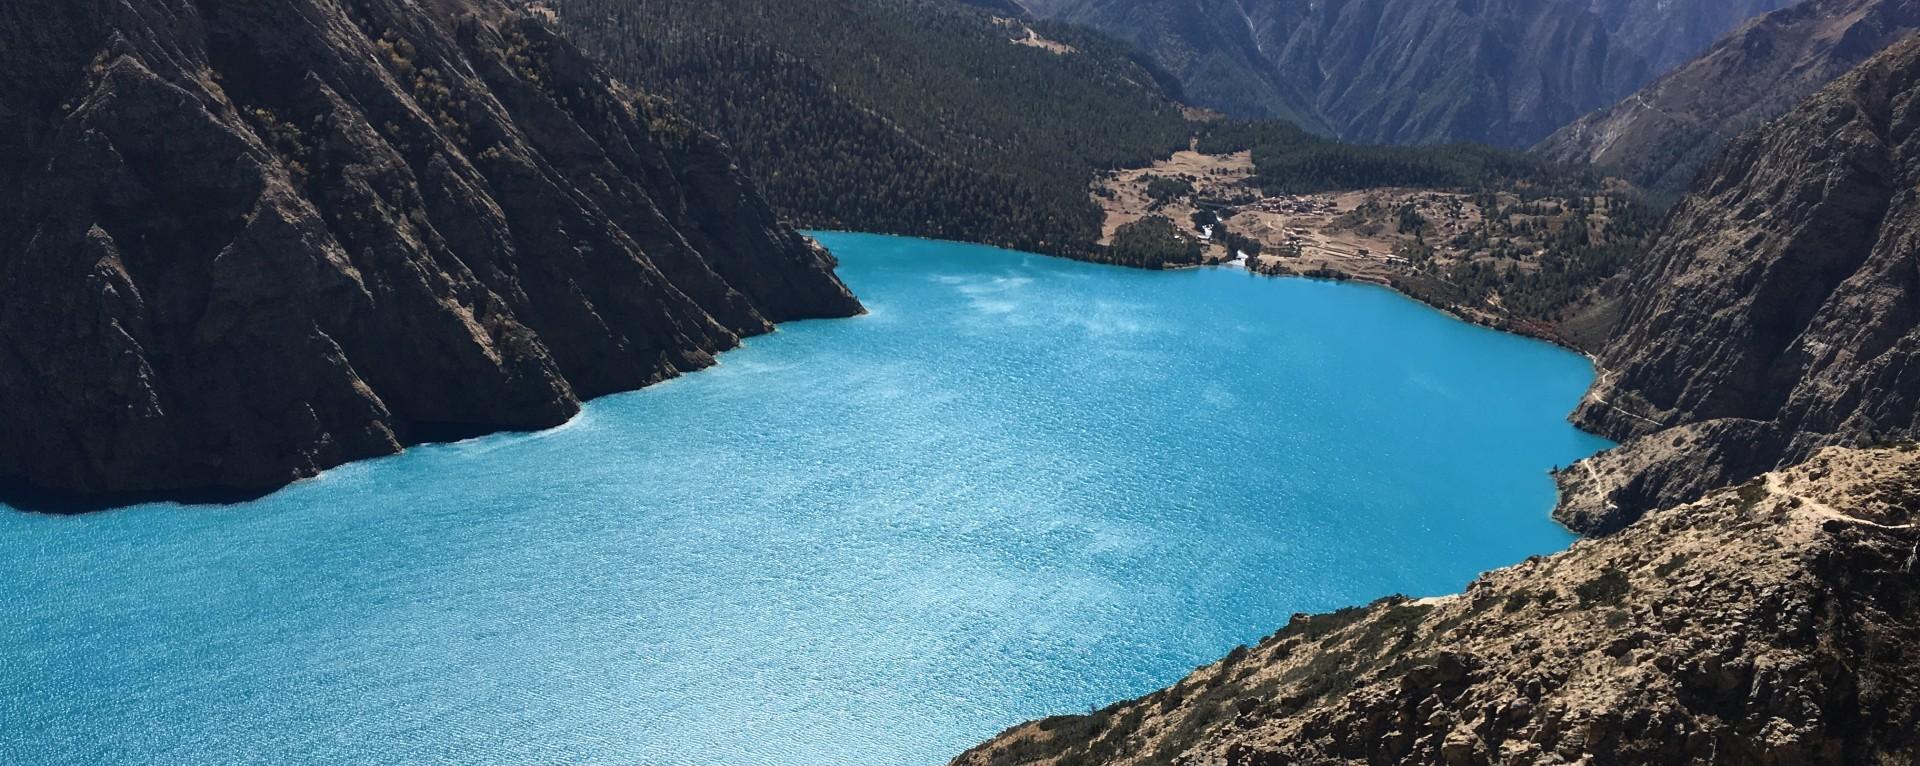 The Torquise color Phoksundo Lake from Dolpo, Nepal